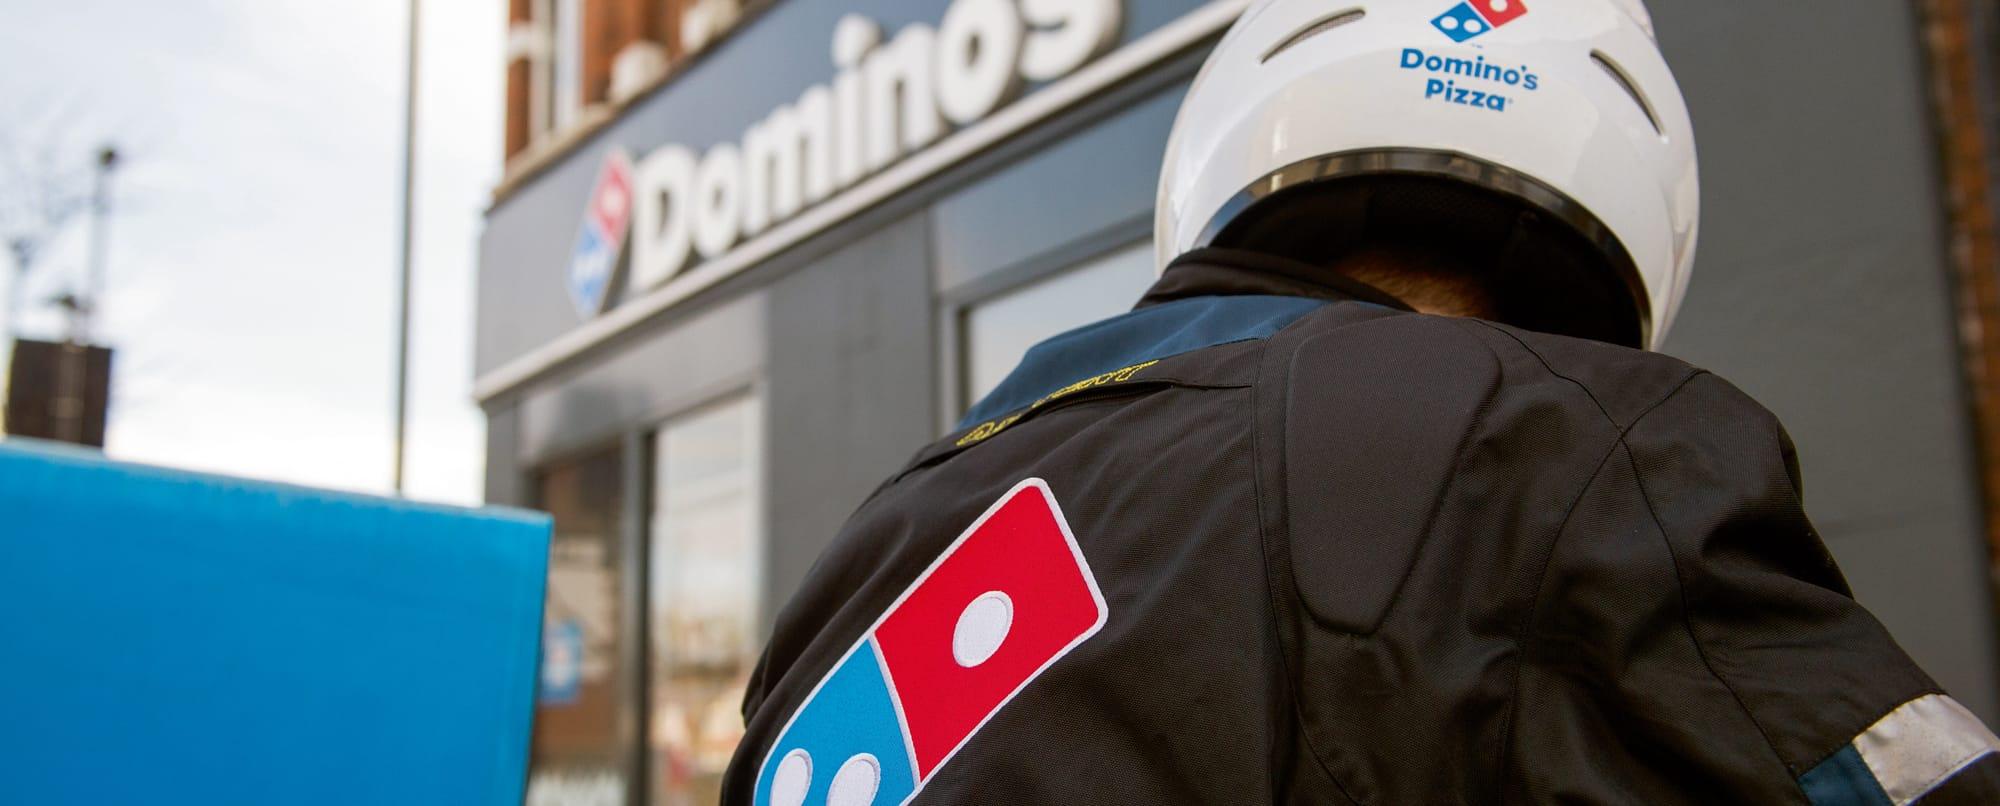 Uk Dominos Pizza Franchise For Sale What Franchise